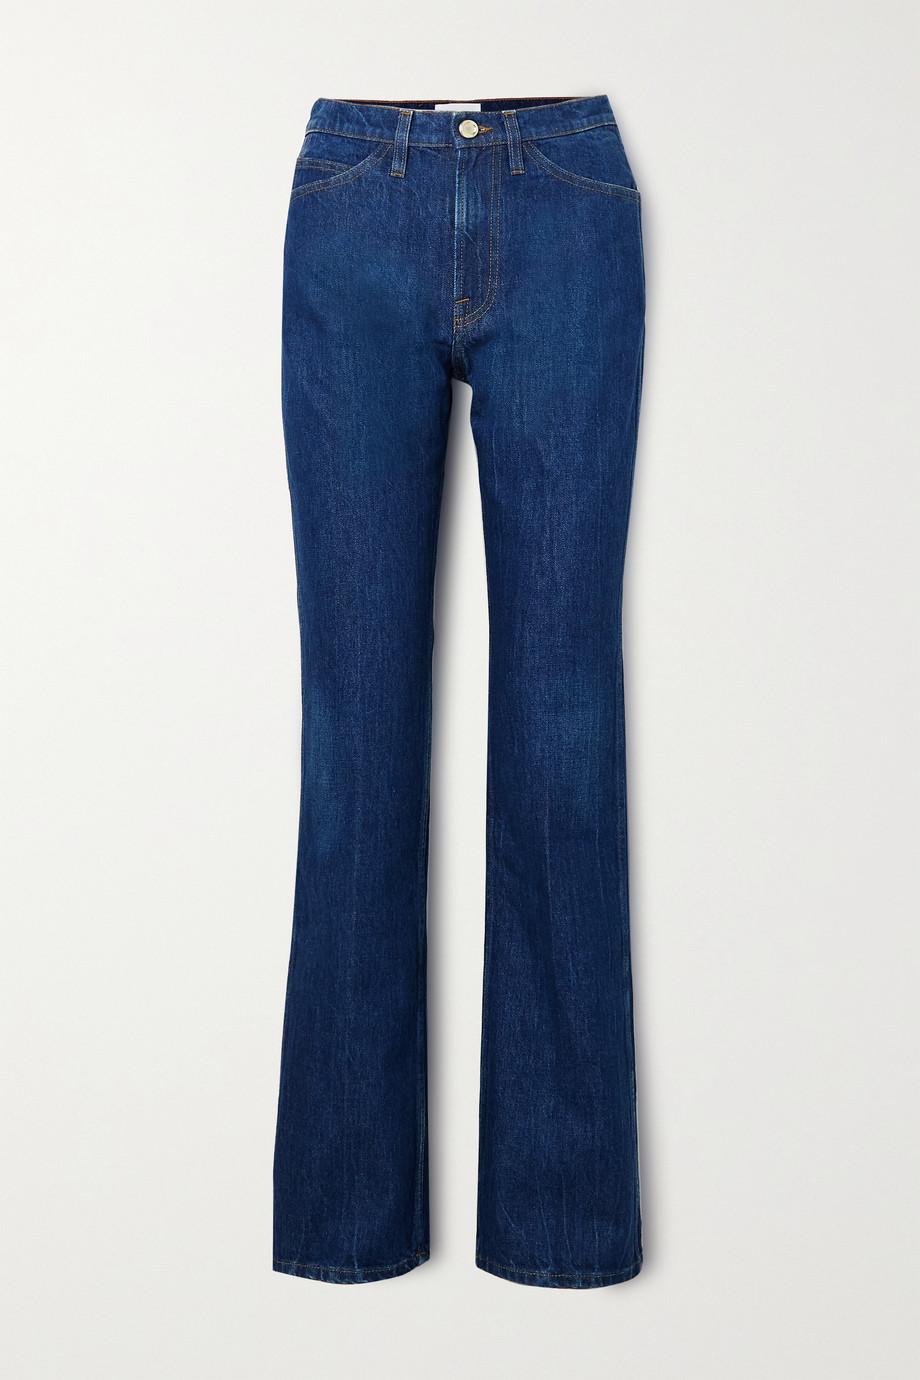 FRAME Le Italien high-rise flared jeans